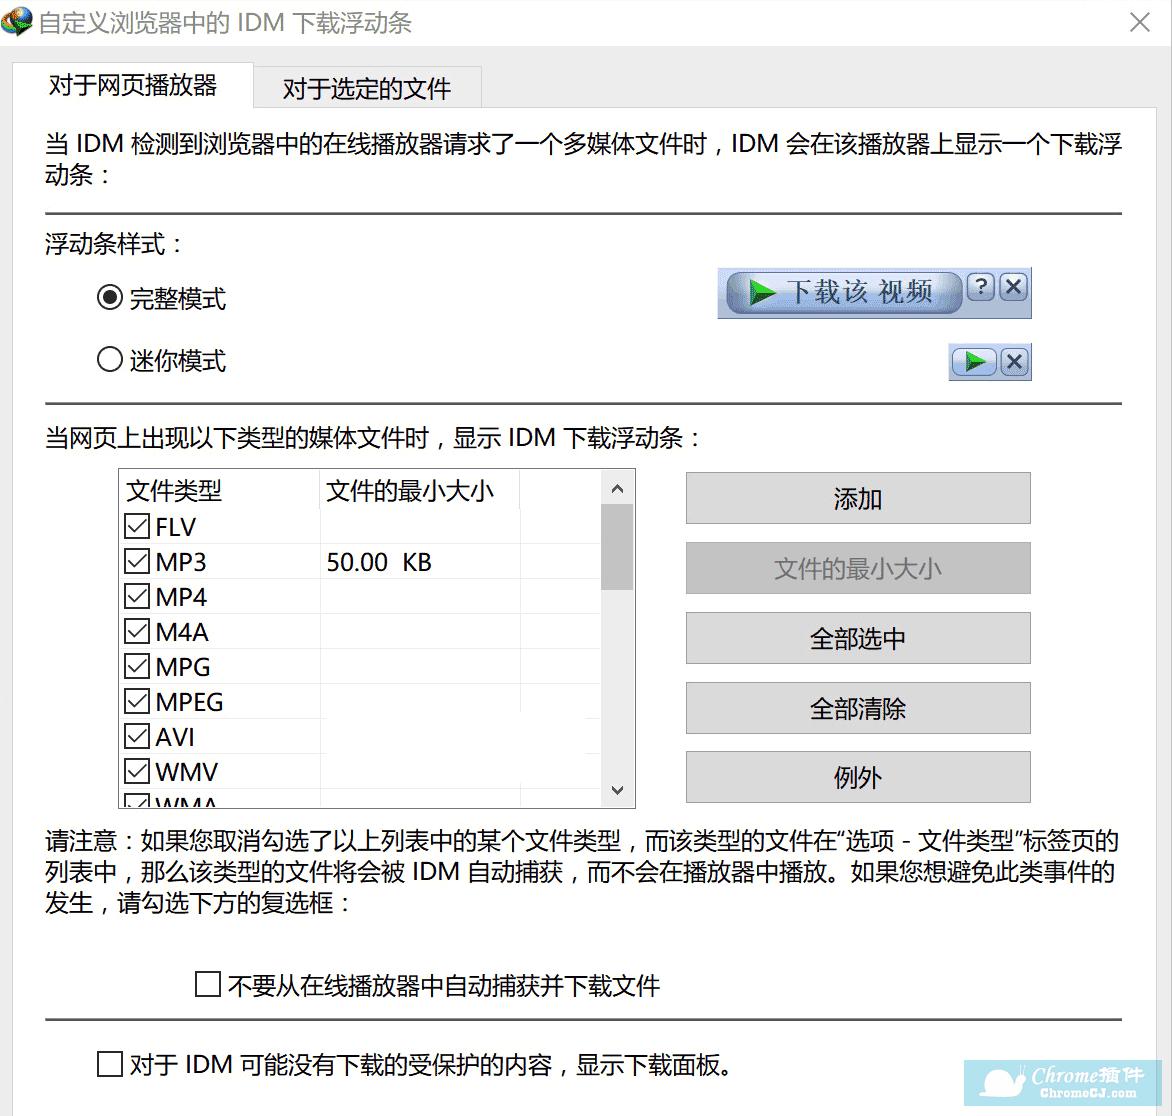 IDM捕获视频/音频等多媒体下载